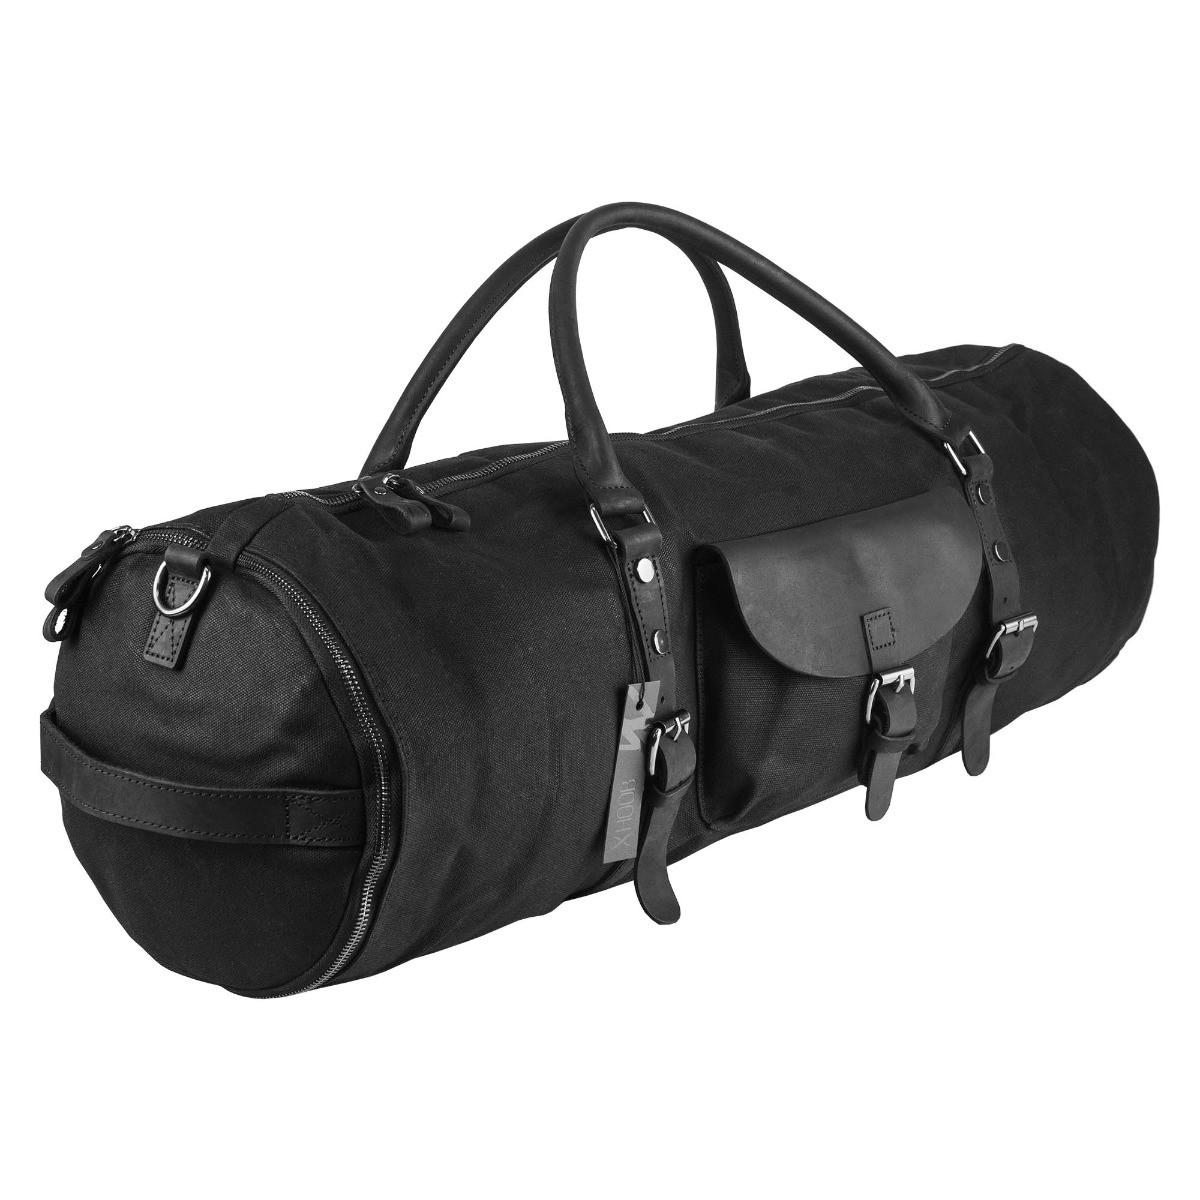 Hoob Long Bag Black | 80 cm canvas & leather bag